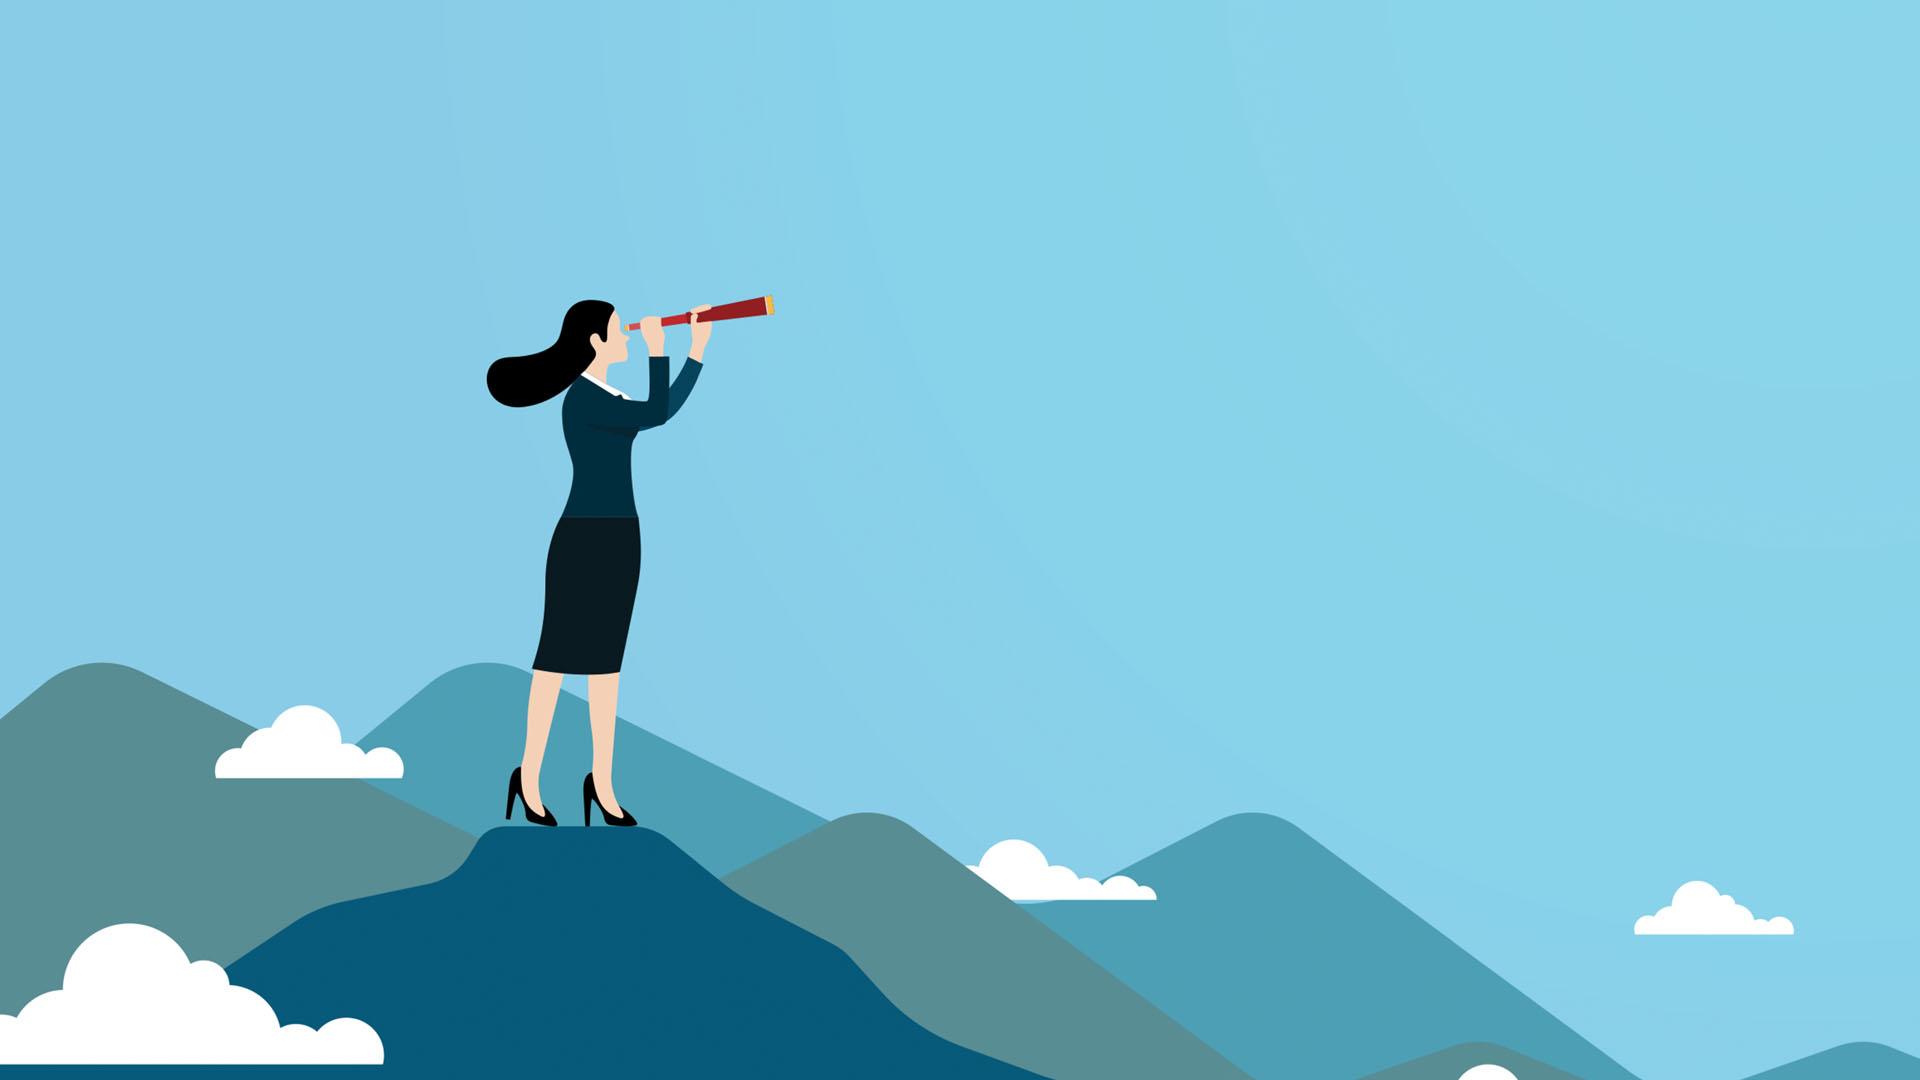 Employement-labor-australia-telescope-woman-mountains